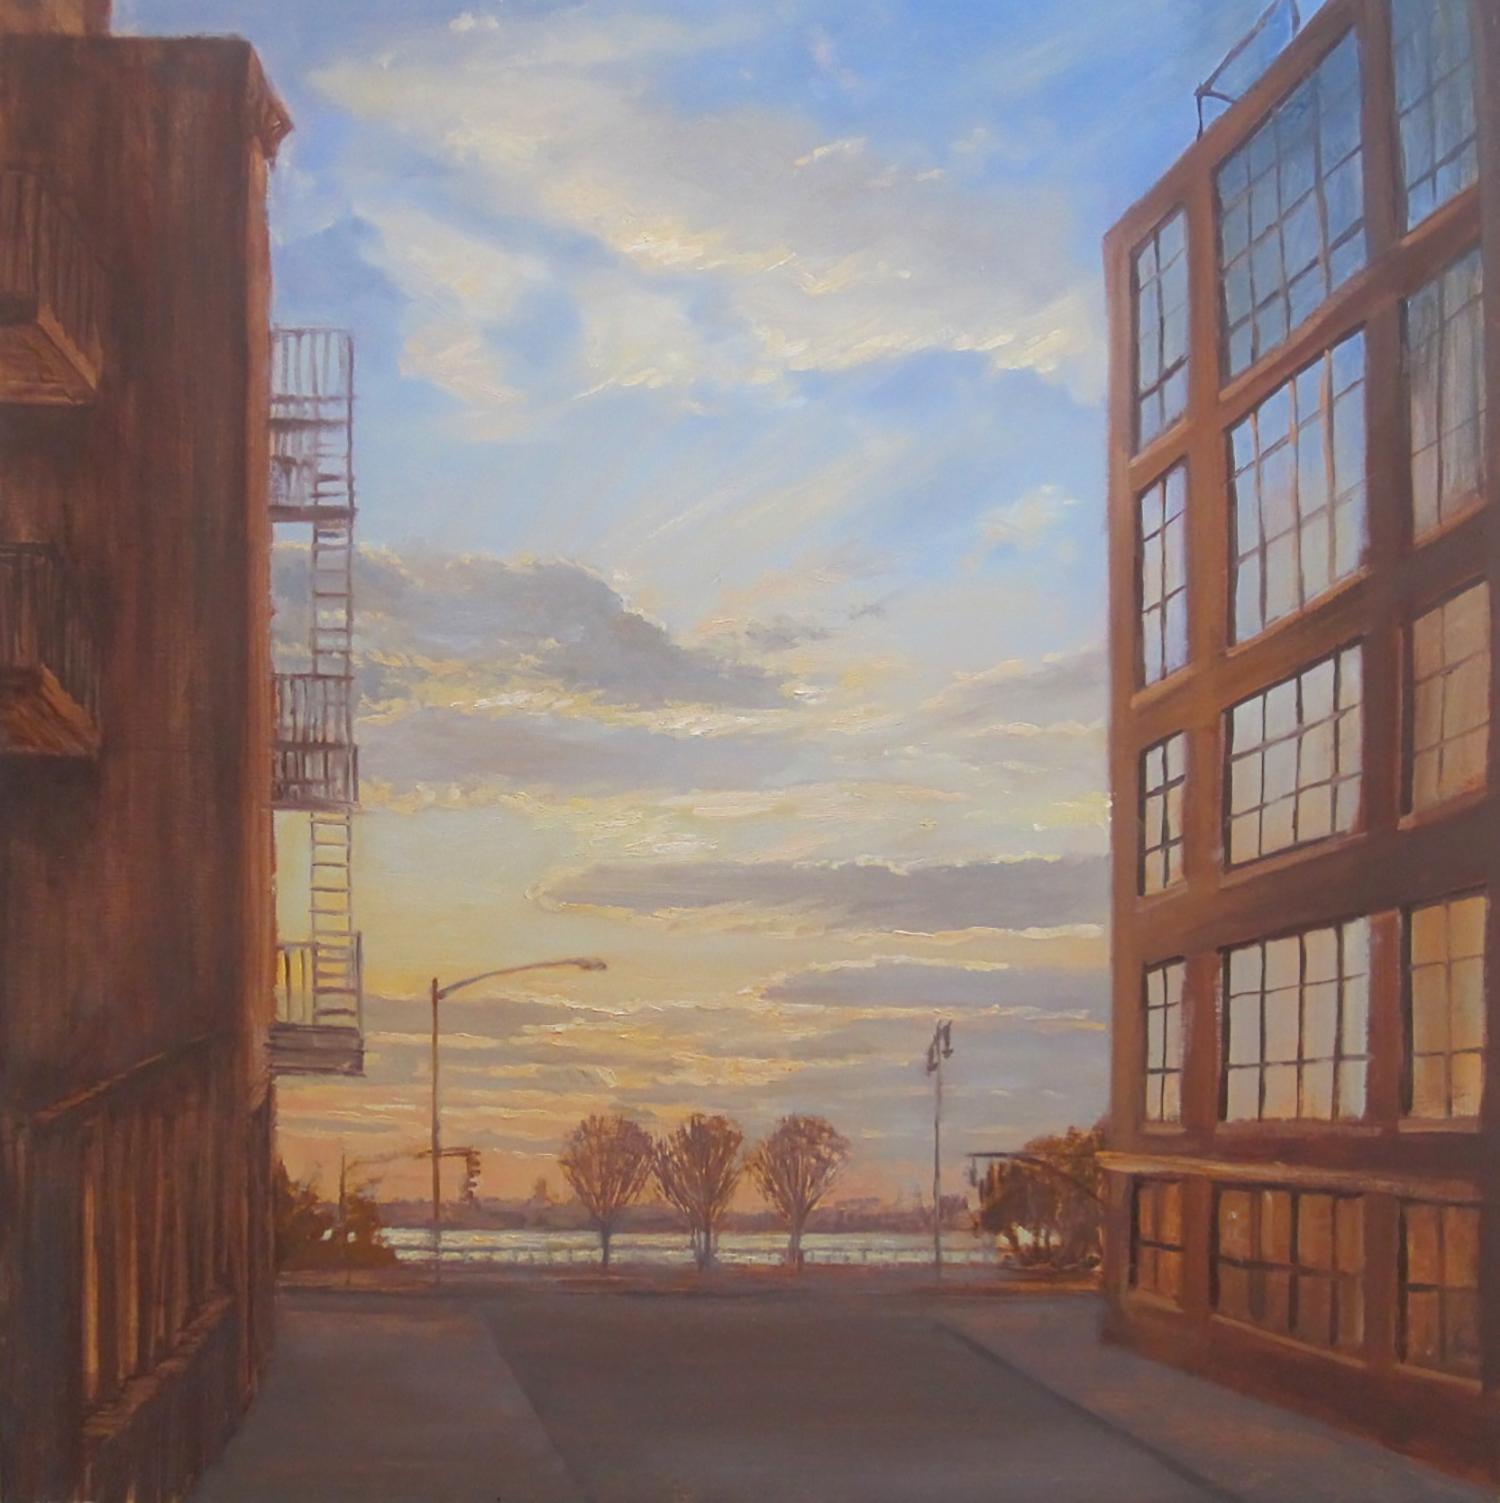 W-NITC-Three Trees March-36x30-oil on canvas-2007-SOLD.jpg